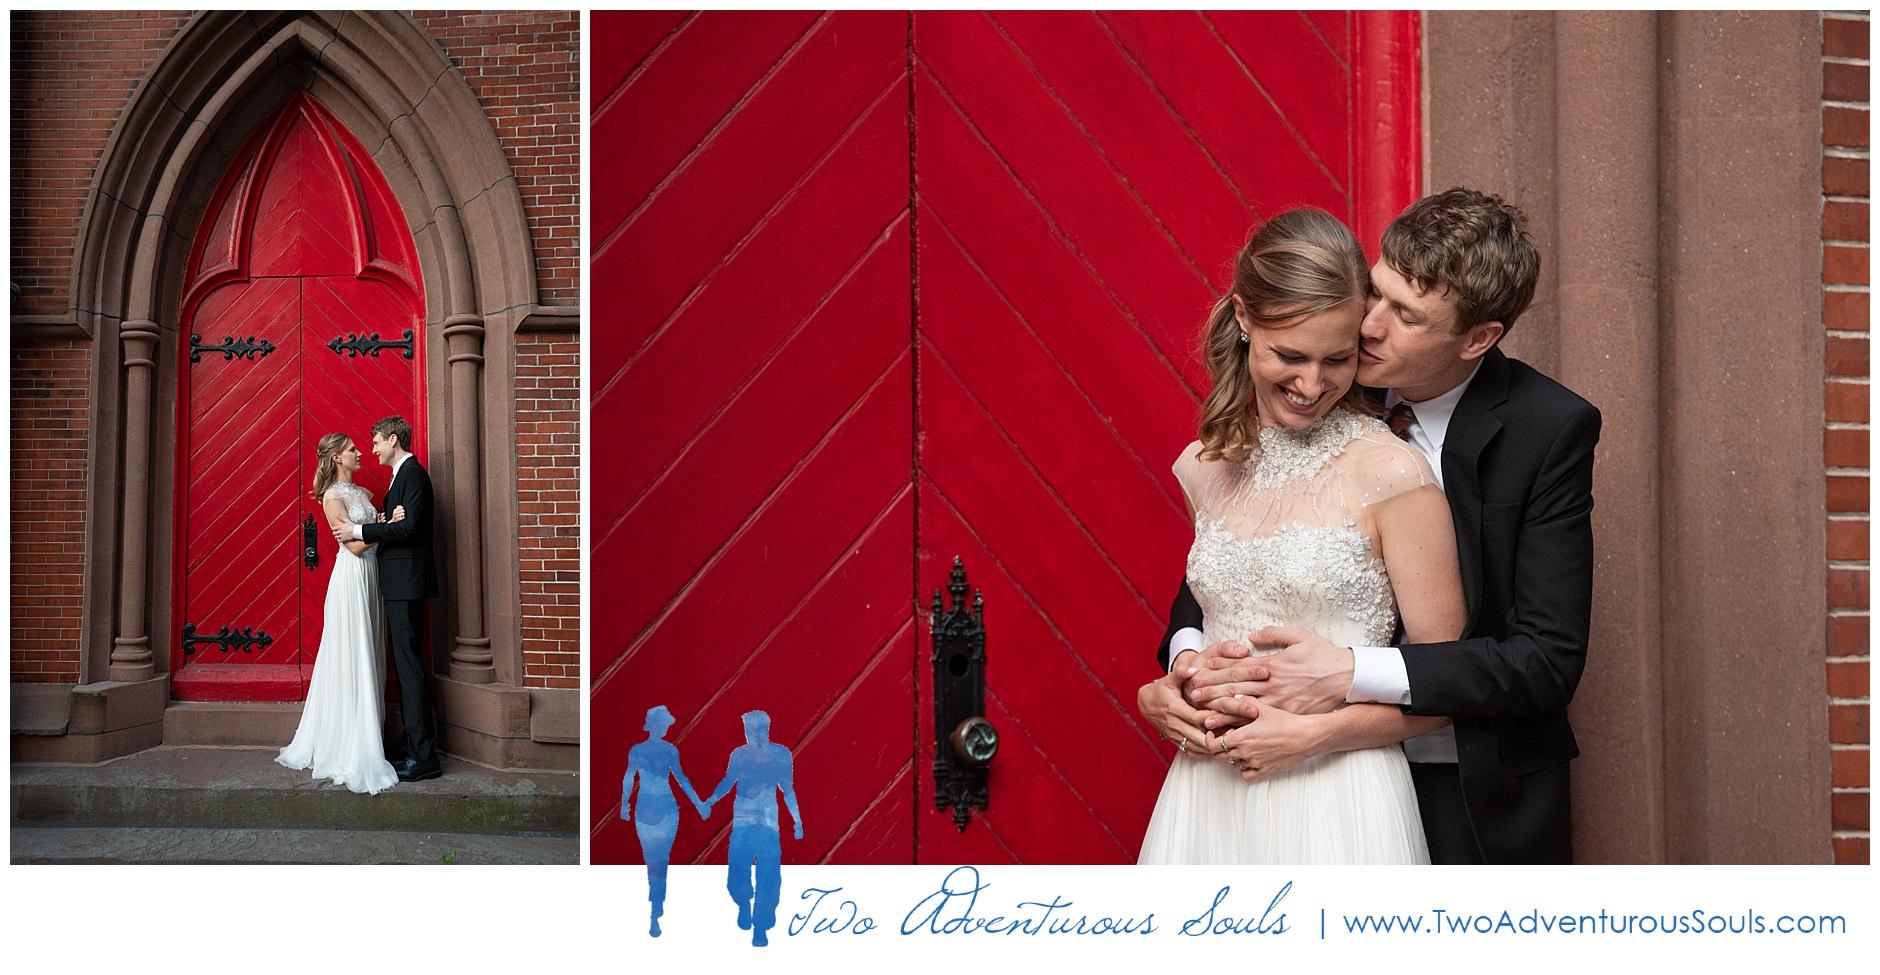 Grace Maine Photographers, Portland Maine Wedding Photographers, Two Adventurous Souls- 090719_0033.jpg